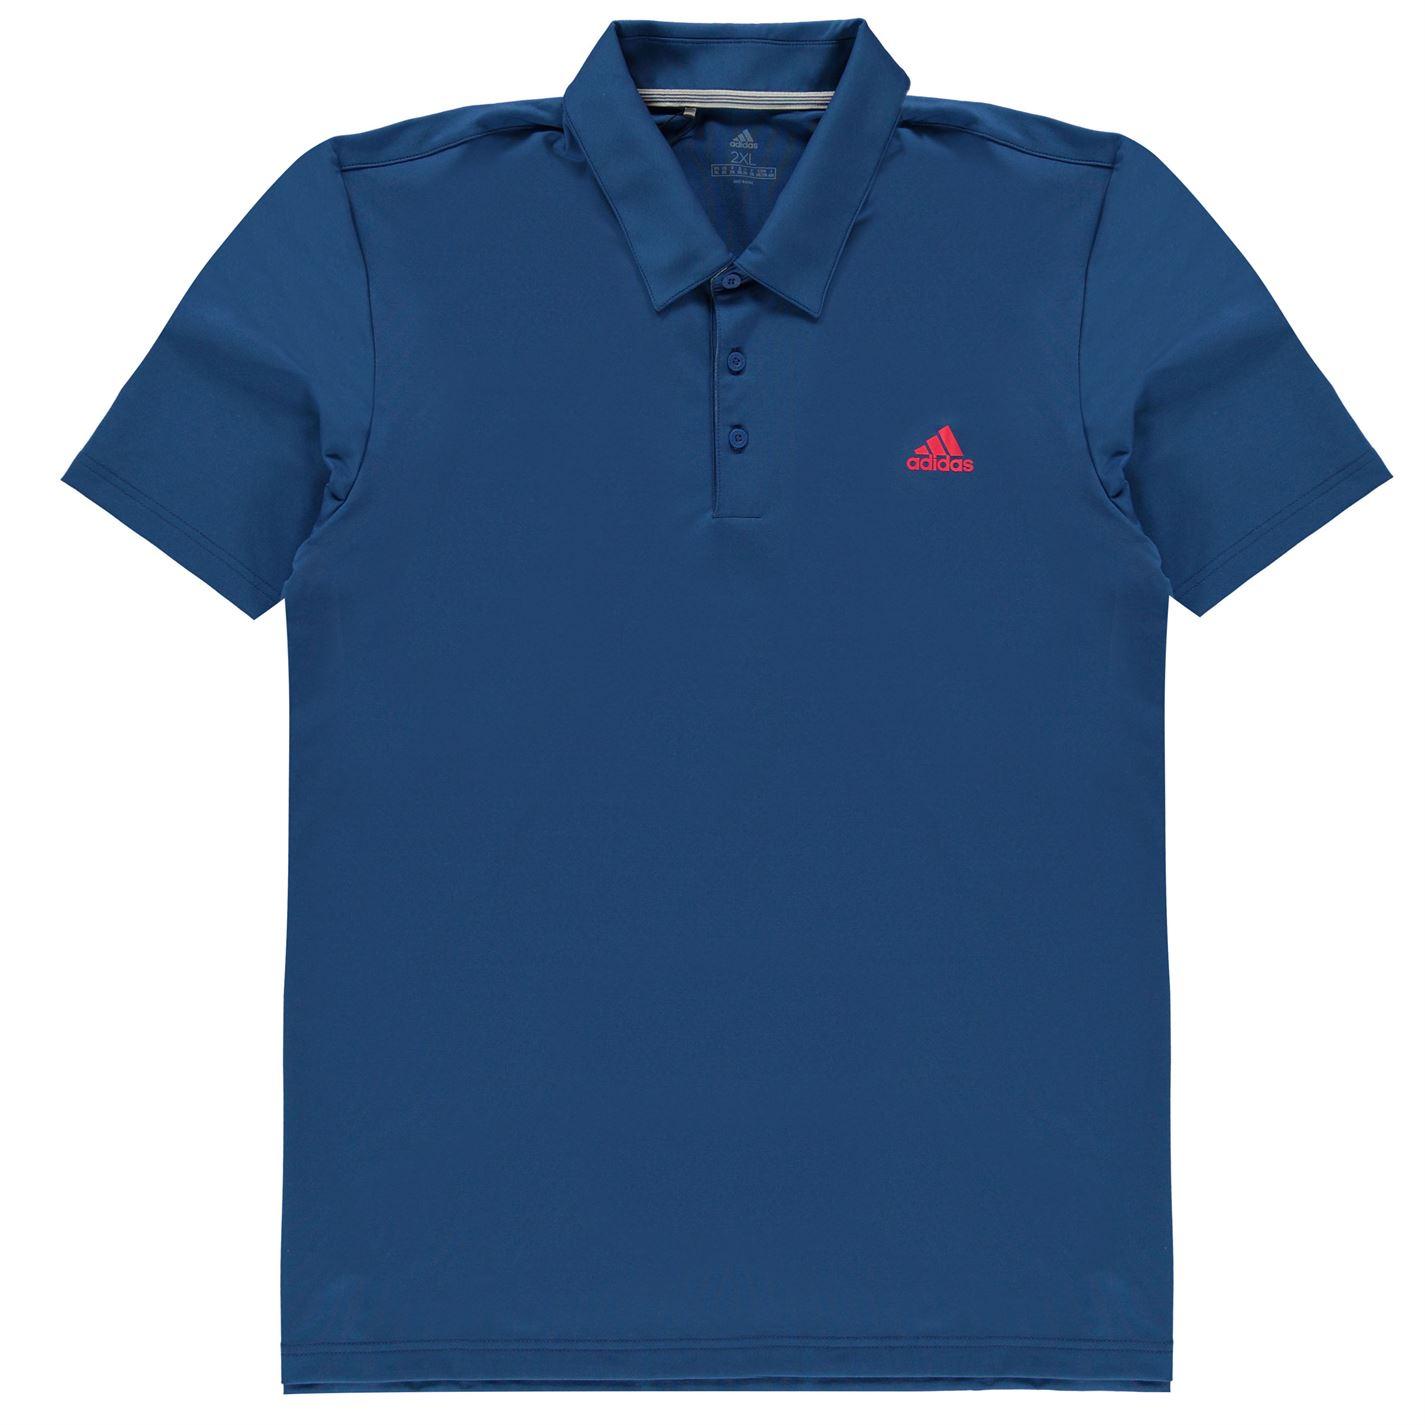 Adidas Ultimate 365 2 Polo Shirt Mens